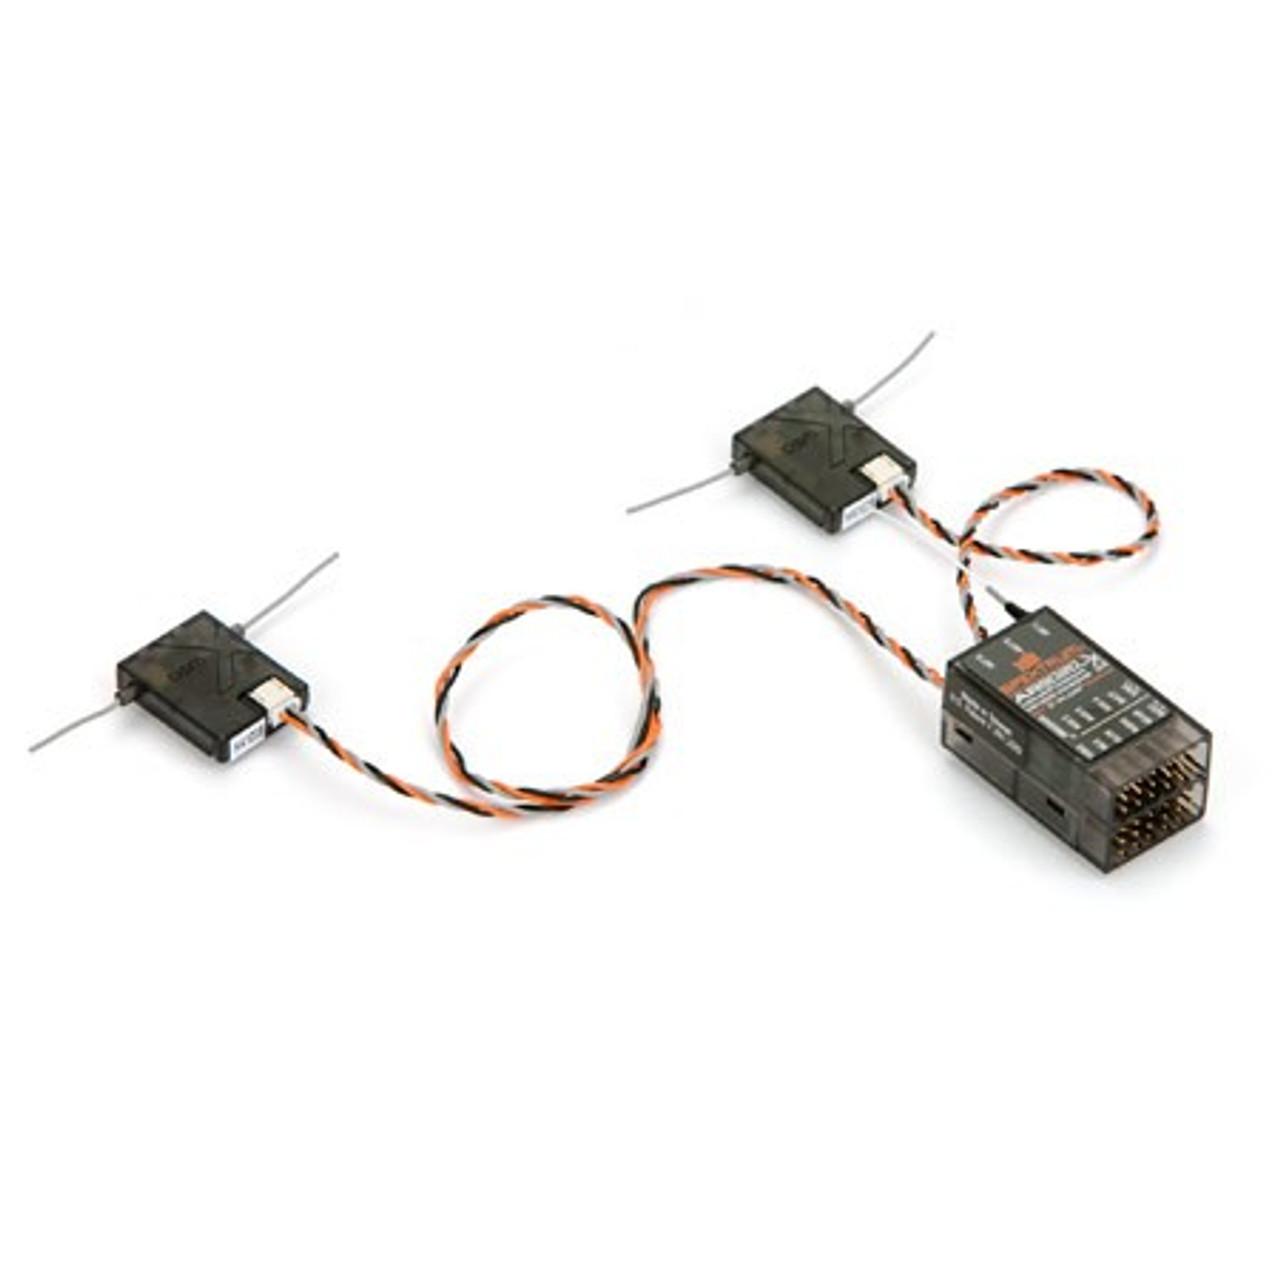 Spektrum AR9020 9-Channel DSMX/XPlus Receiver